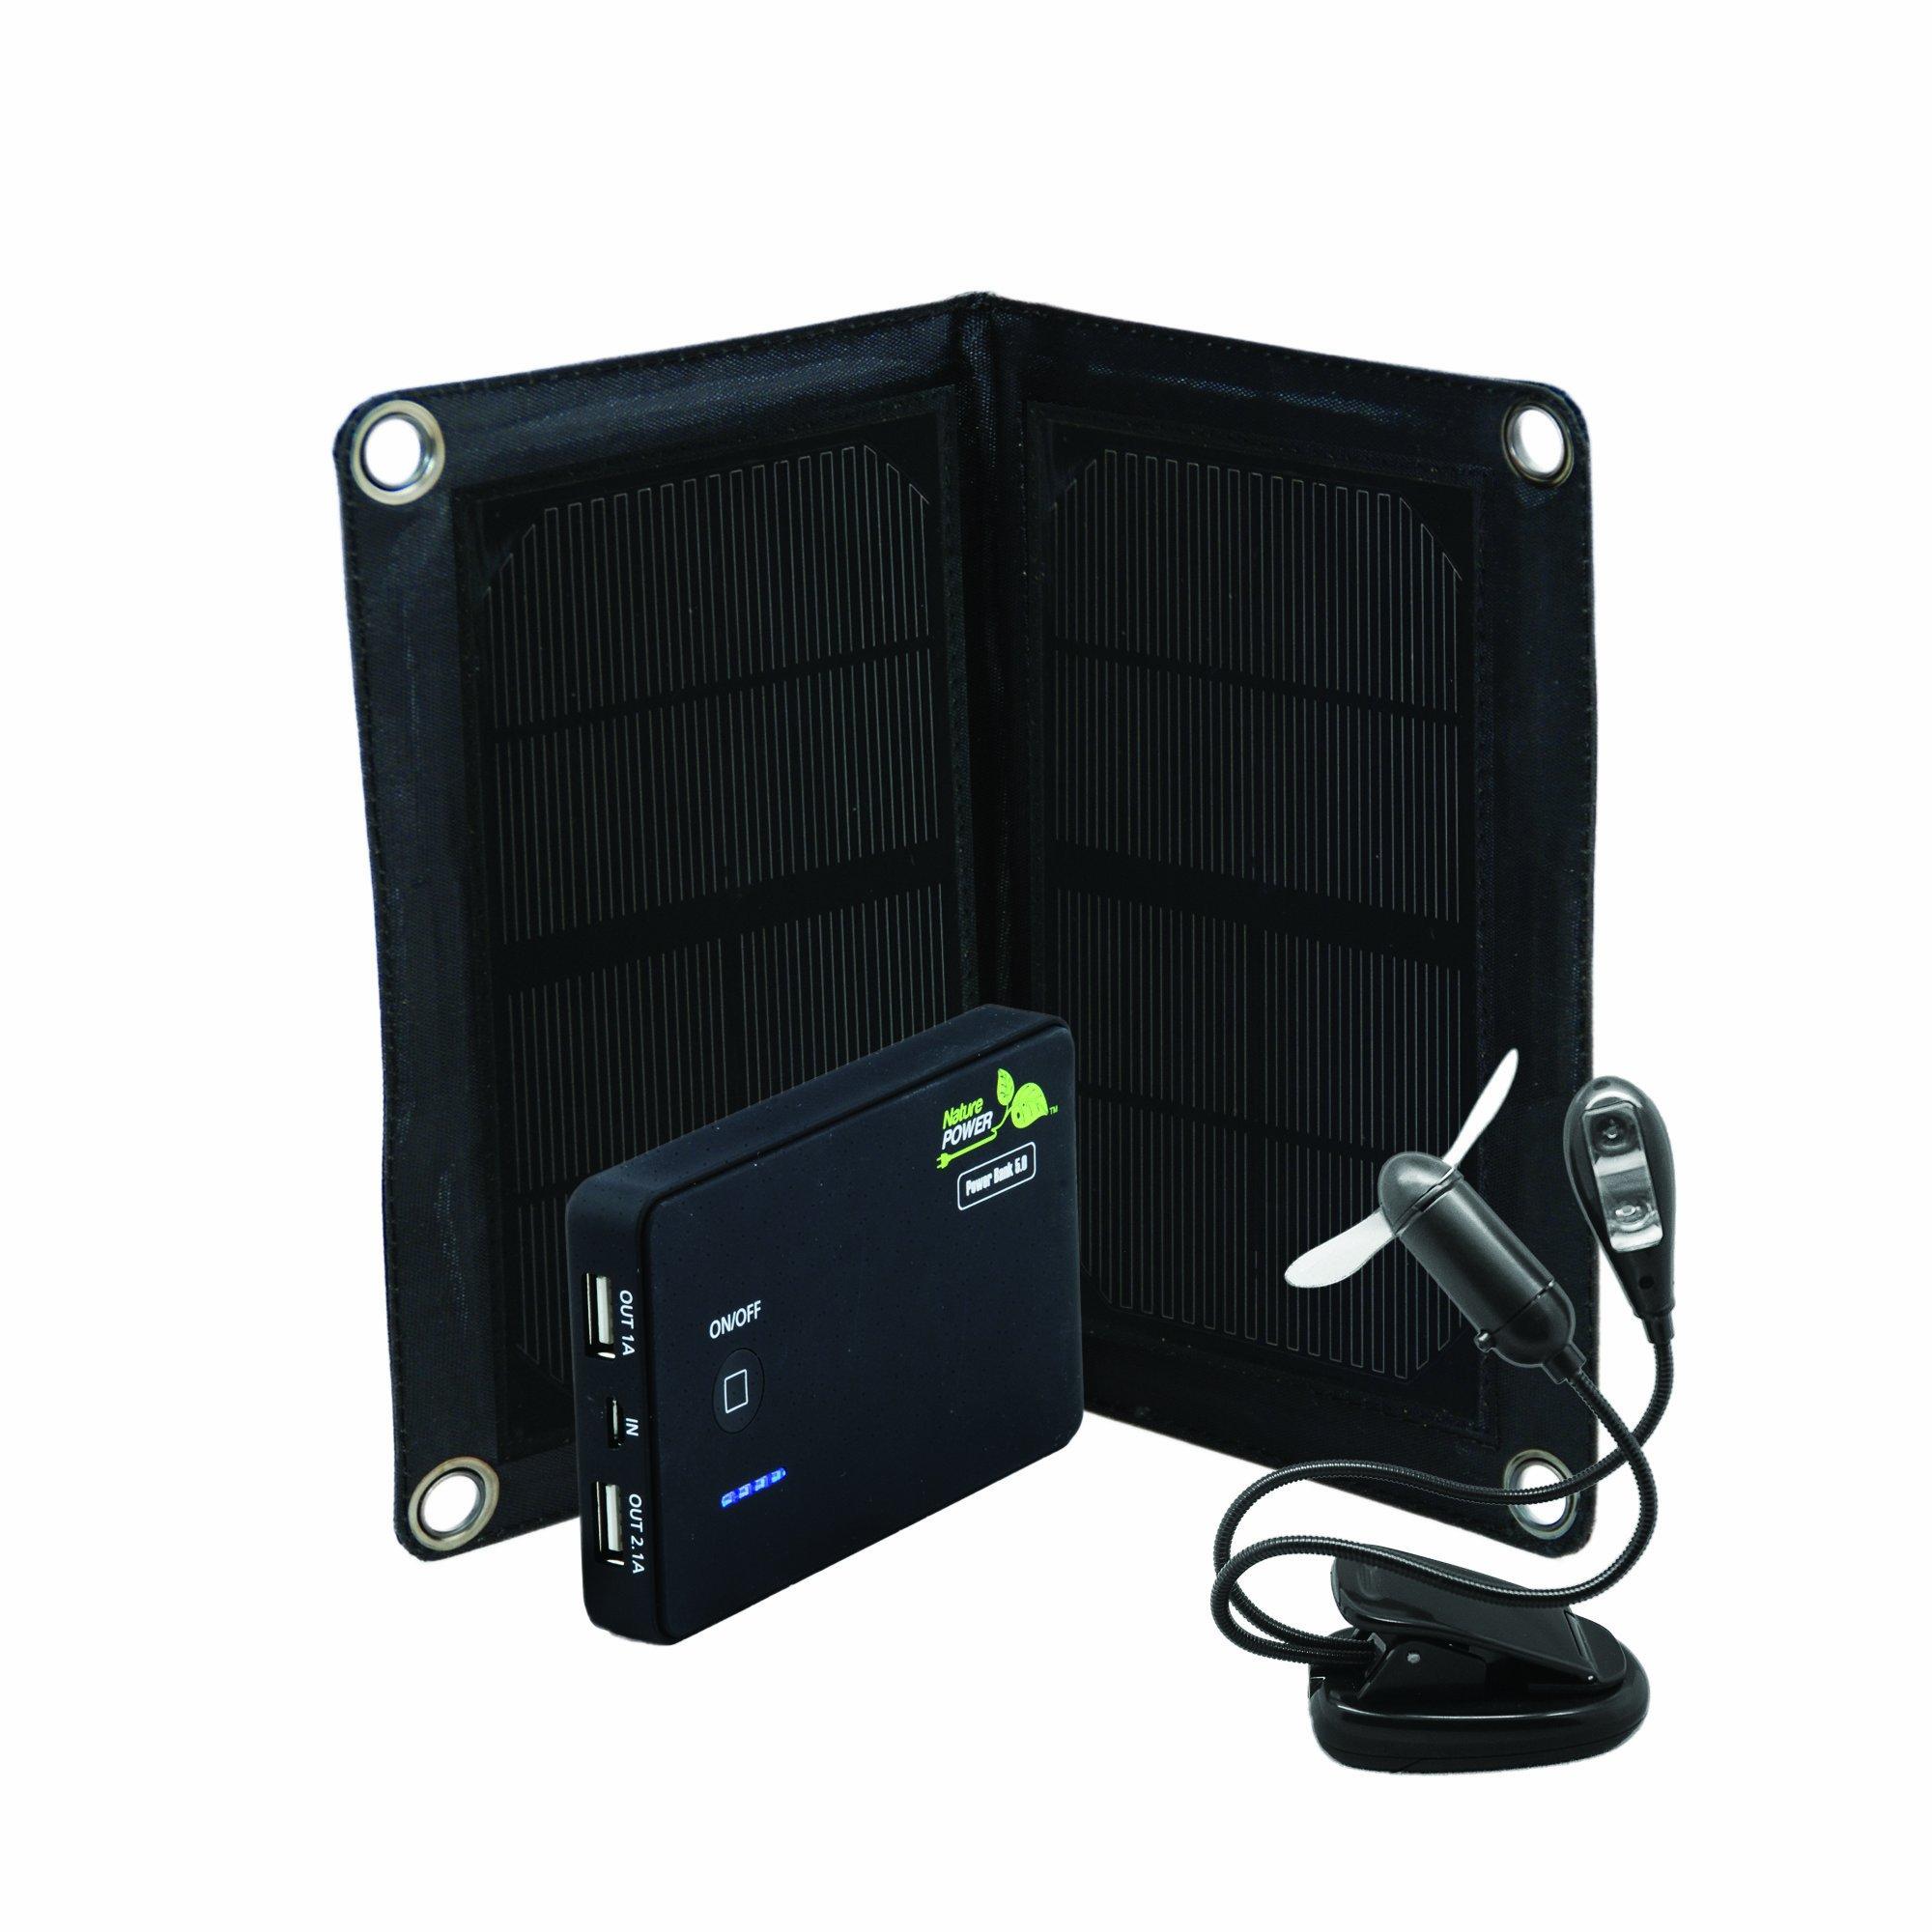 Nature Power 59801 Power Bank 5 Deluxe Portable Solar Power Kit